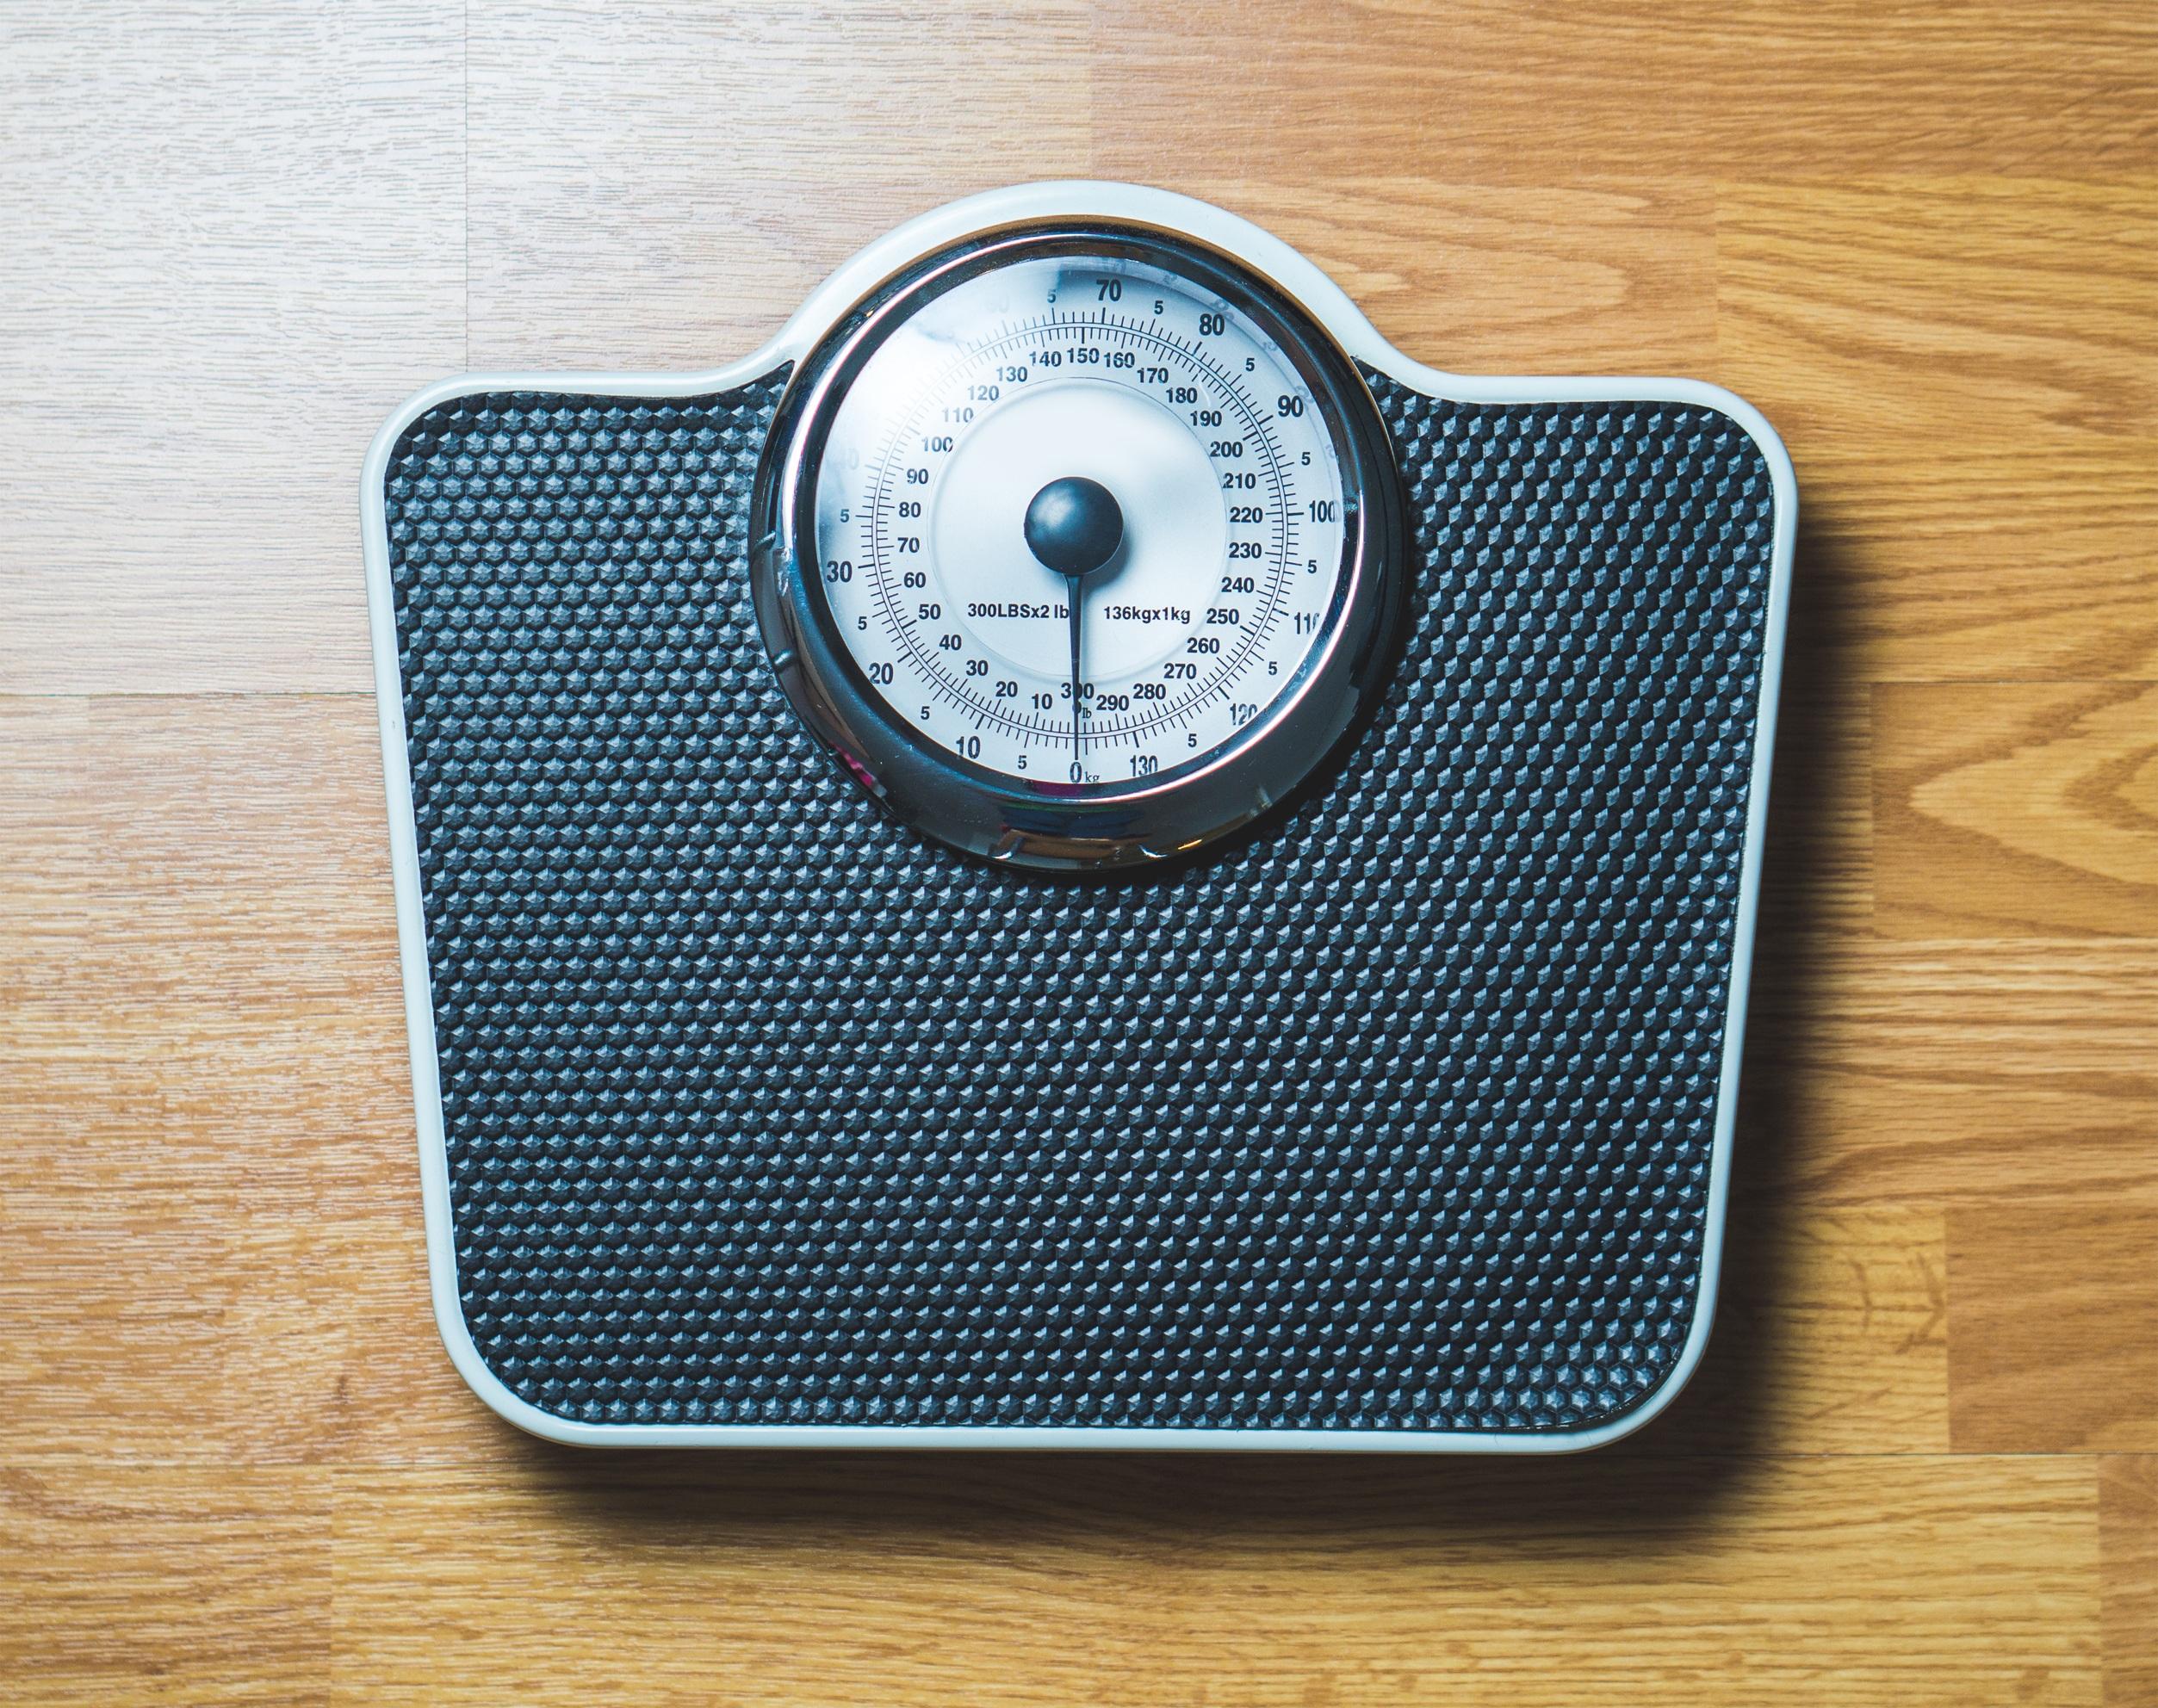 Sovrappeso nei cani